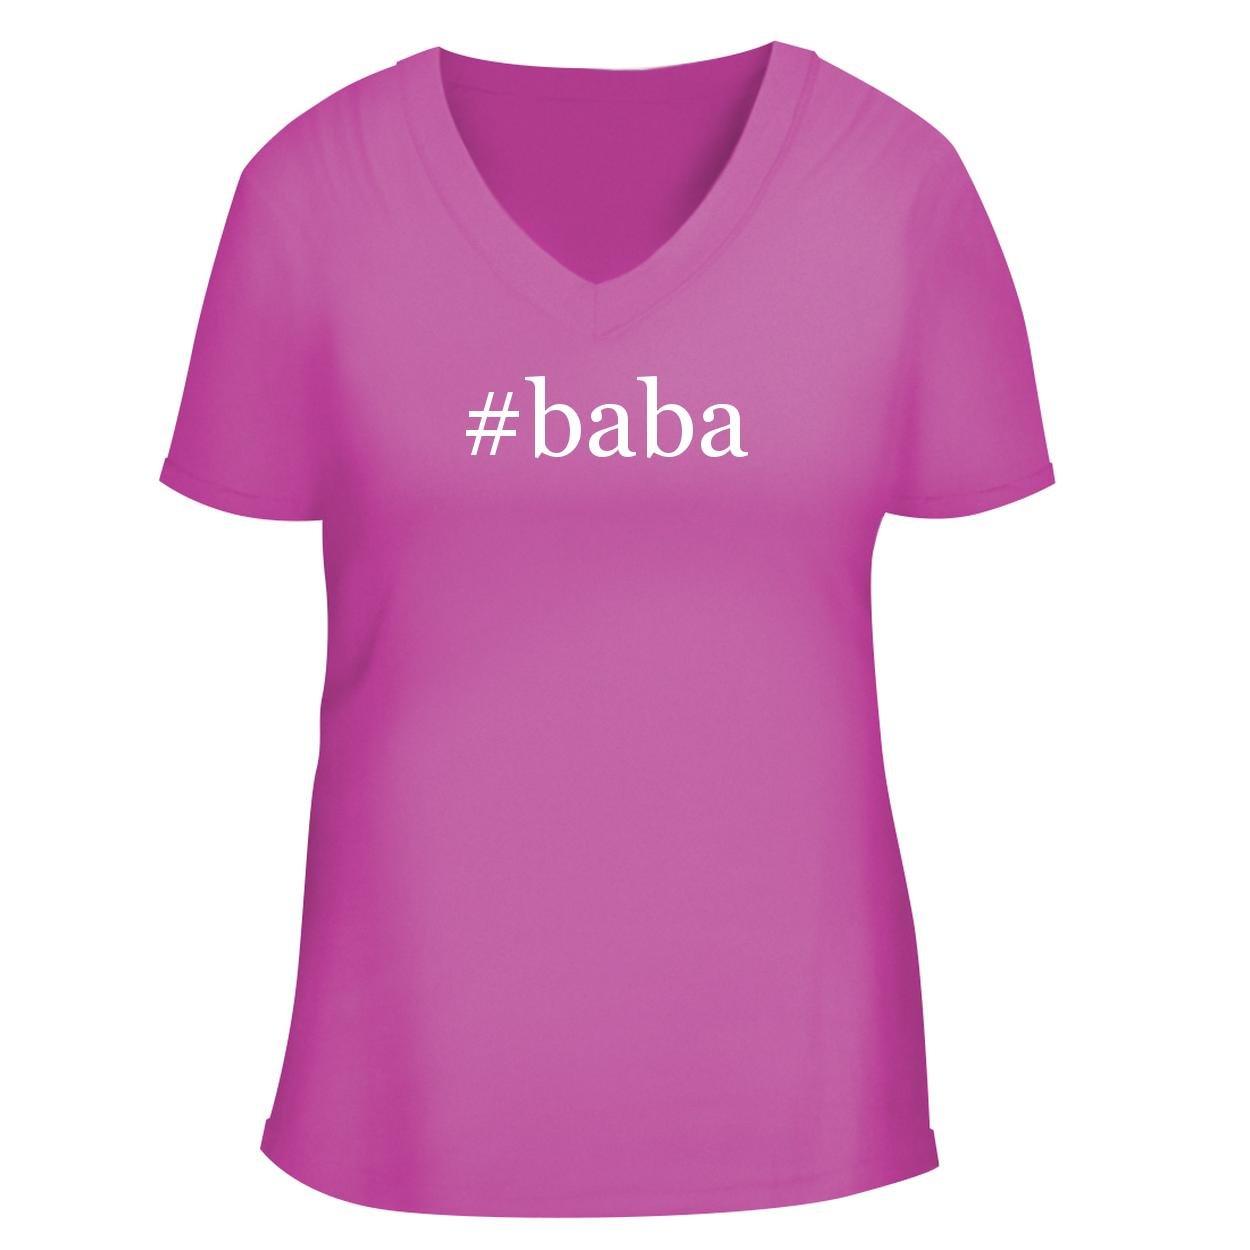 Baba Cute Graphic Tee 3703 Shirts